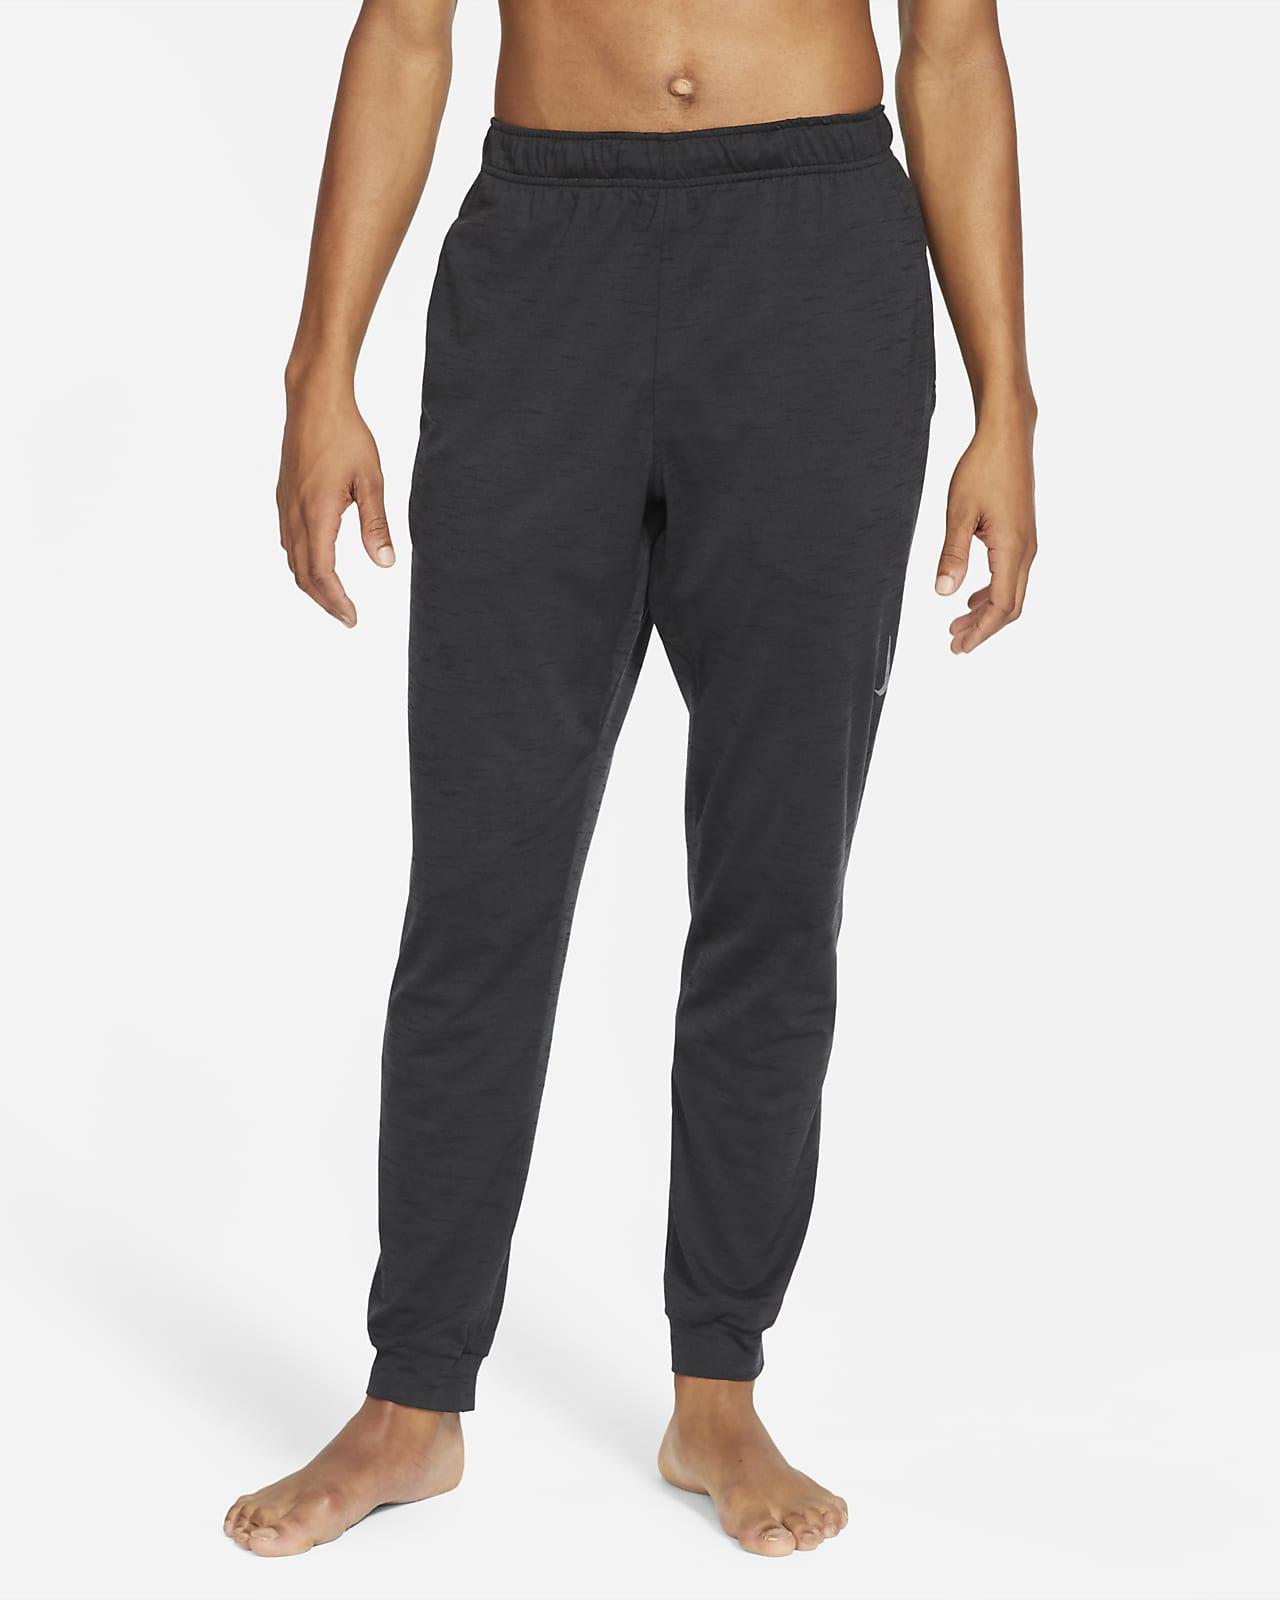 Pants para hombre Nike Yoga Dri-FIT